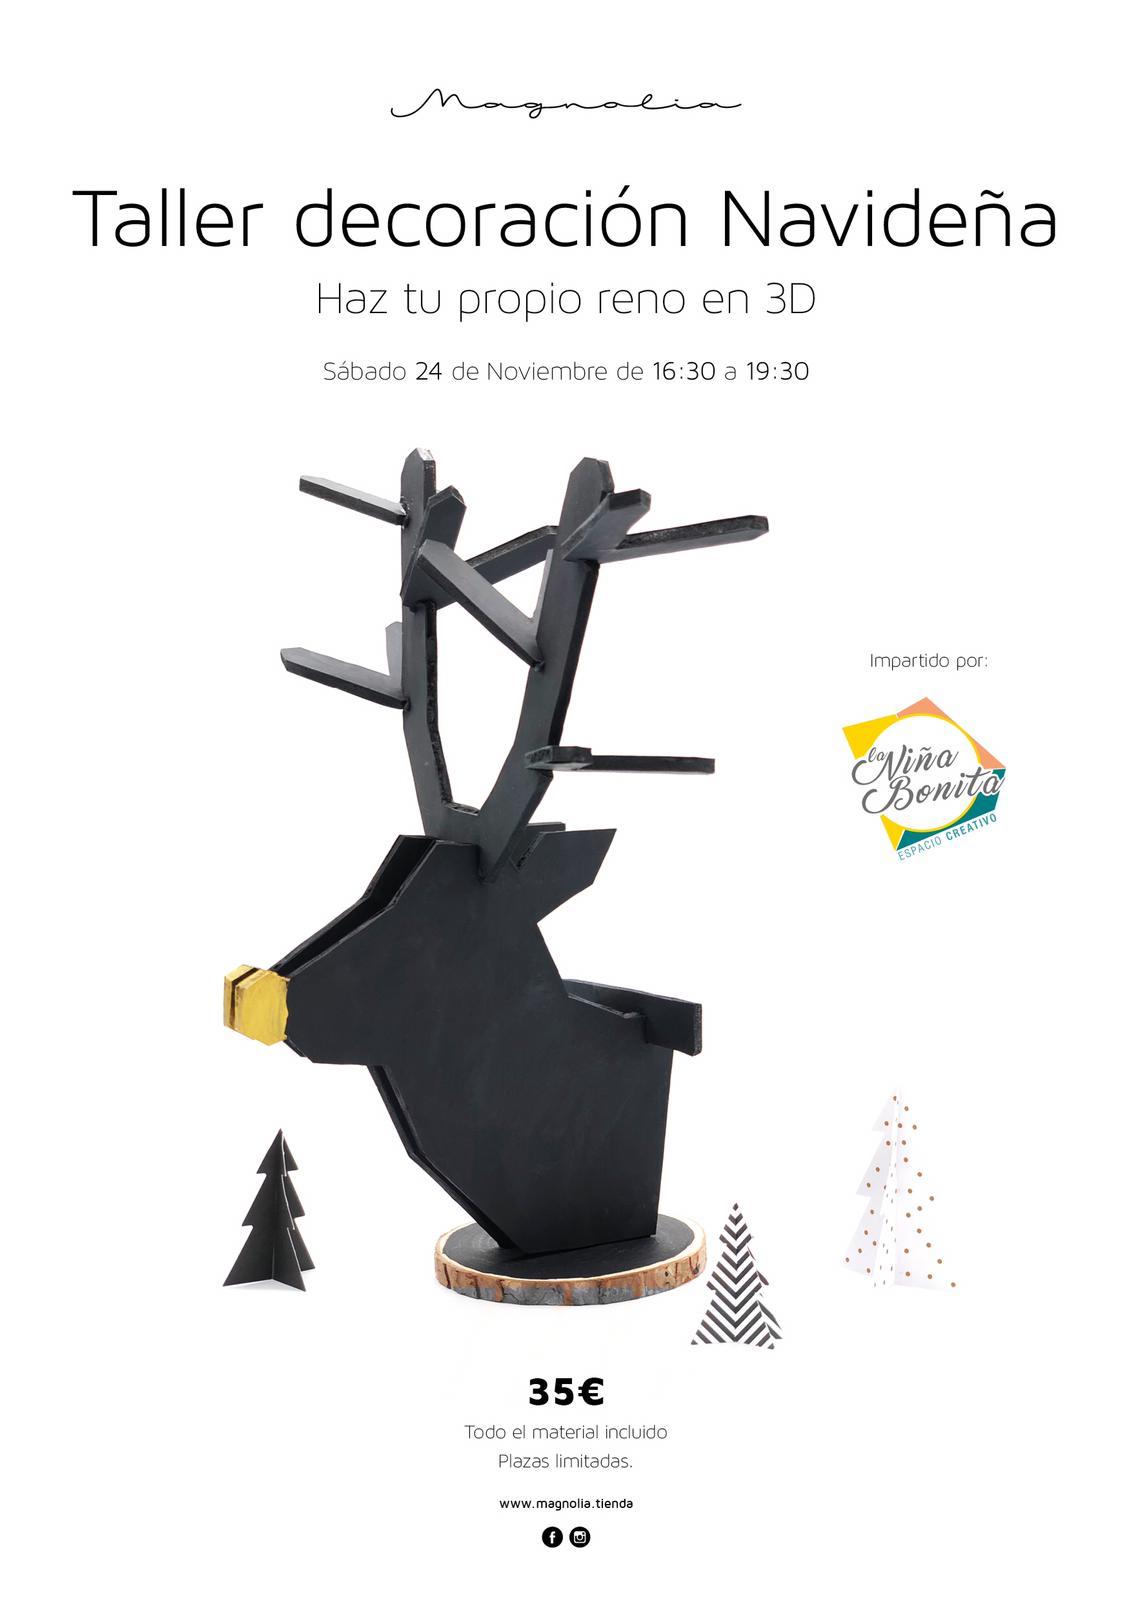 Reno Navidad en 3d